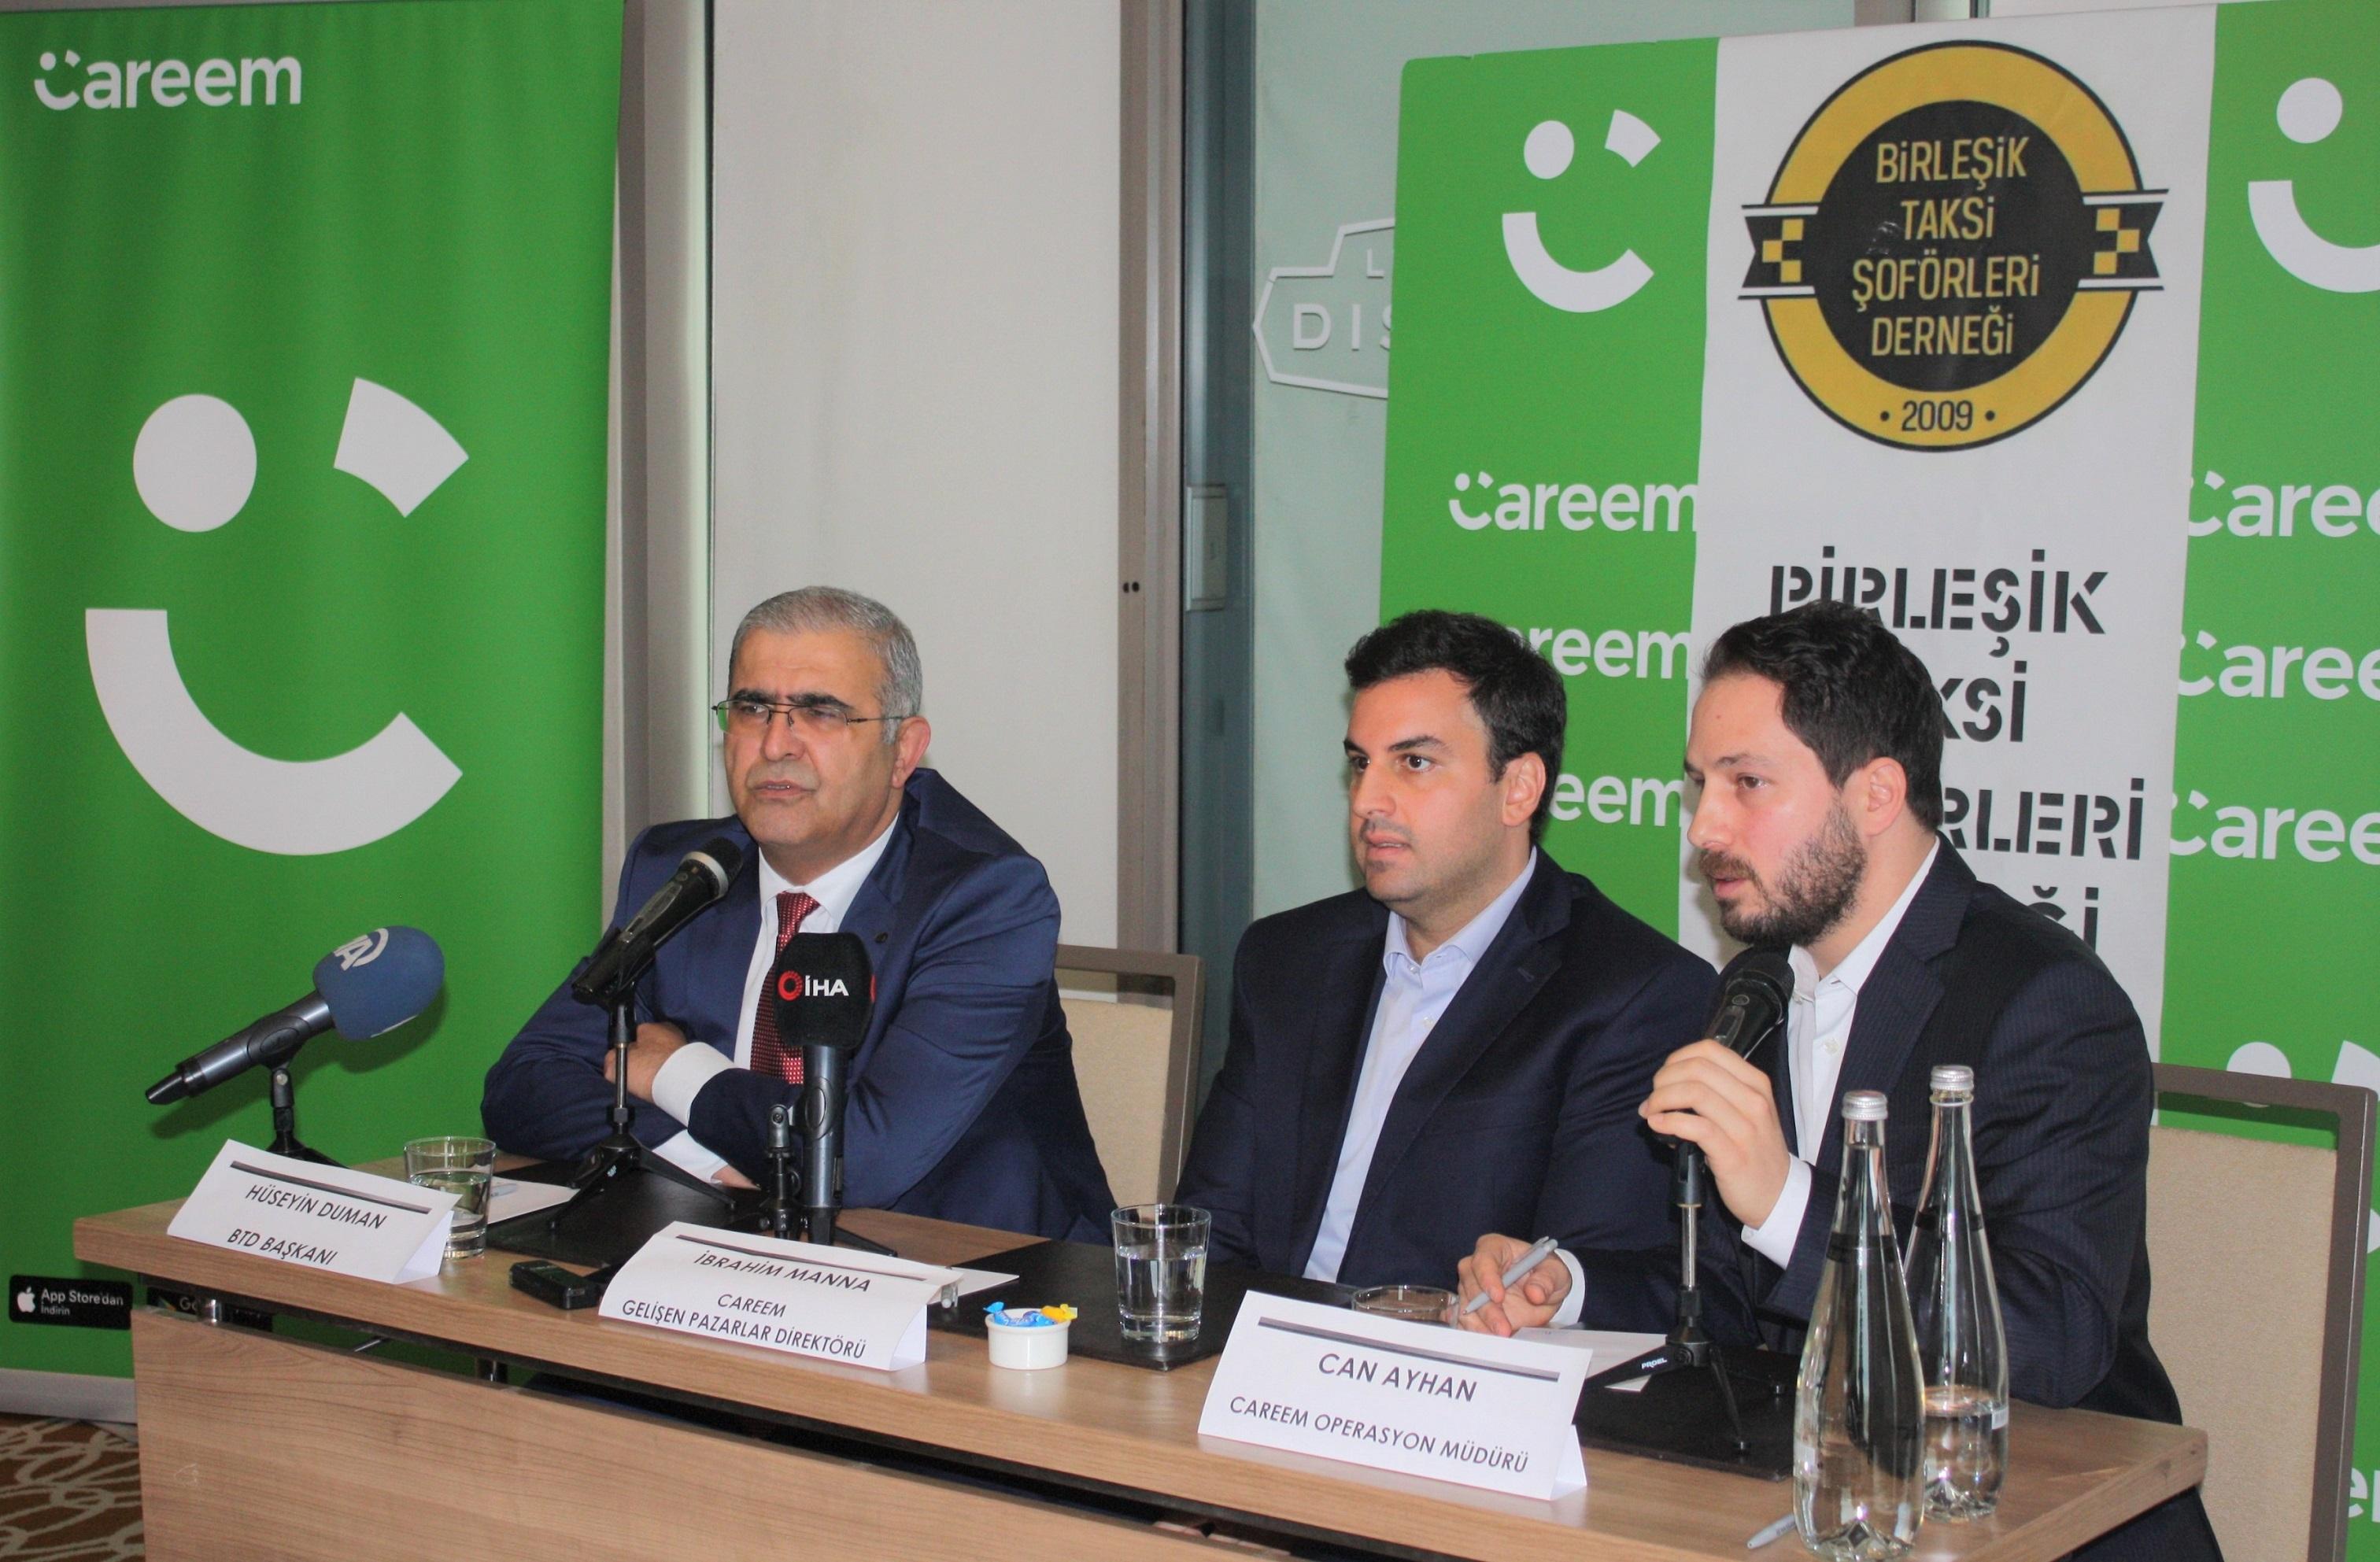 Careem'den ezber bozan proje